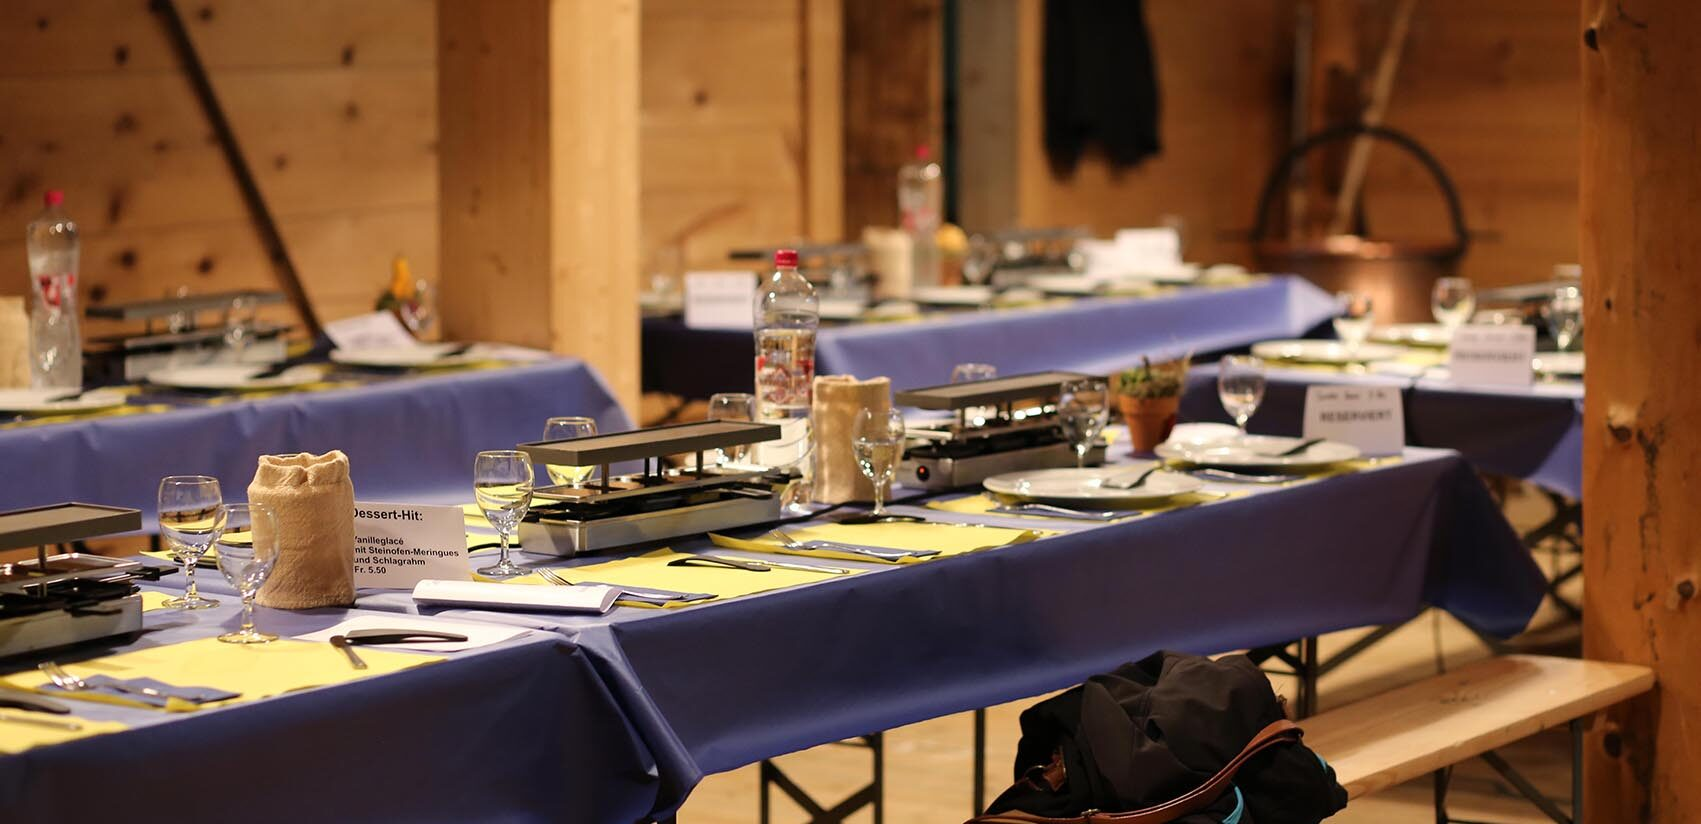 natürli Racletteplausch